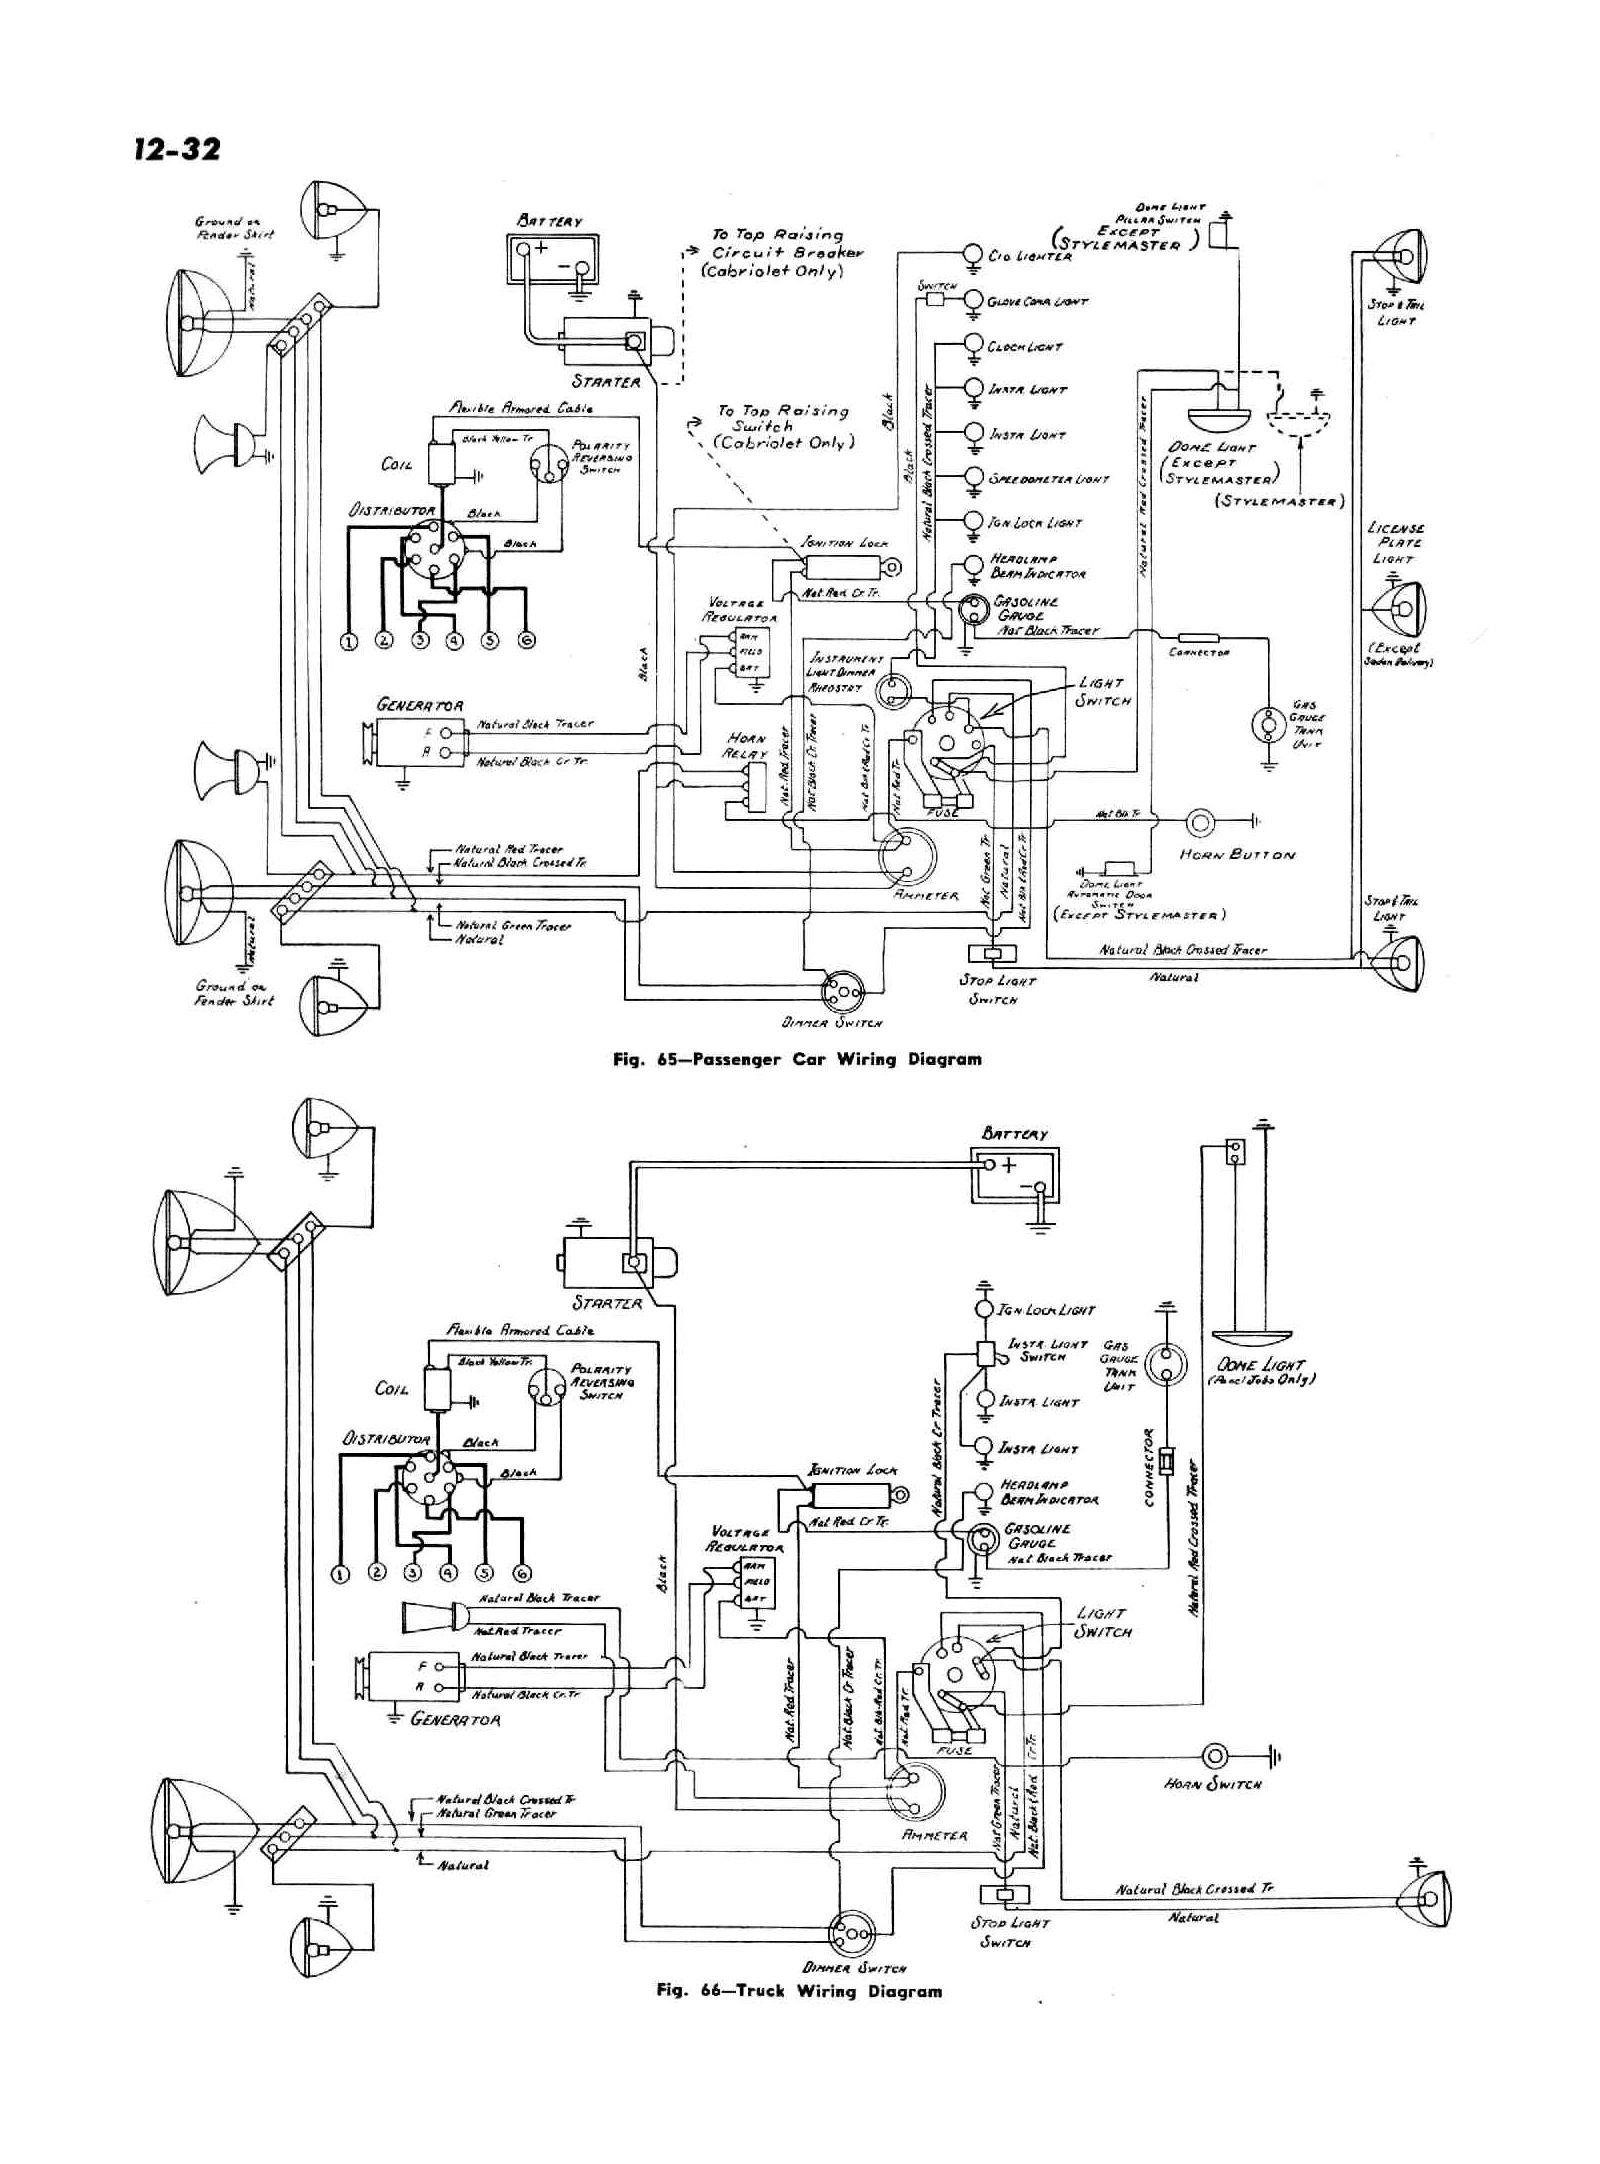 Awe Inspiring For 1942 Chevrolet 11 2 Ton Lc 4X2 Truckcar Wiring Diagram Wiring Cloud Ymoonsalvmohammedshrineorg